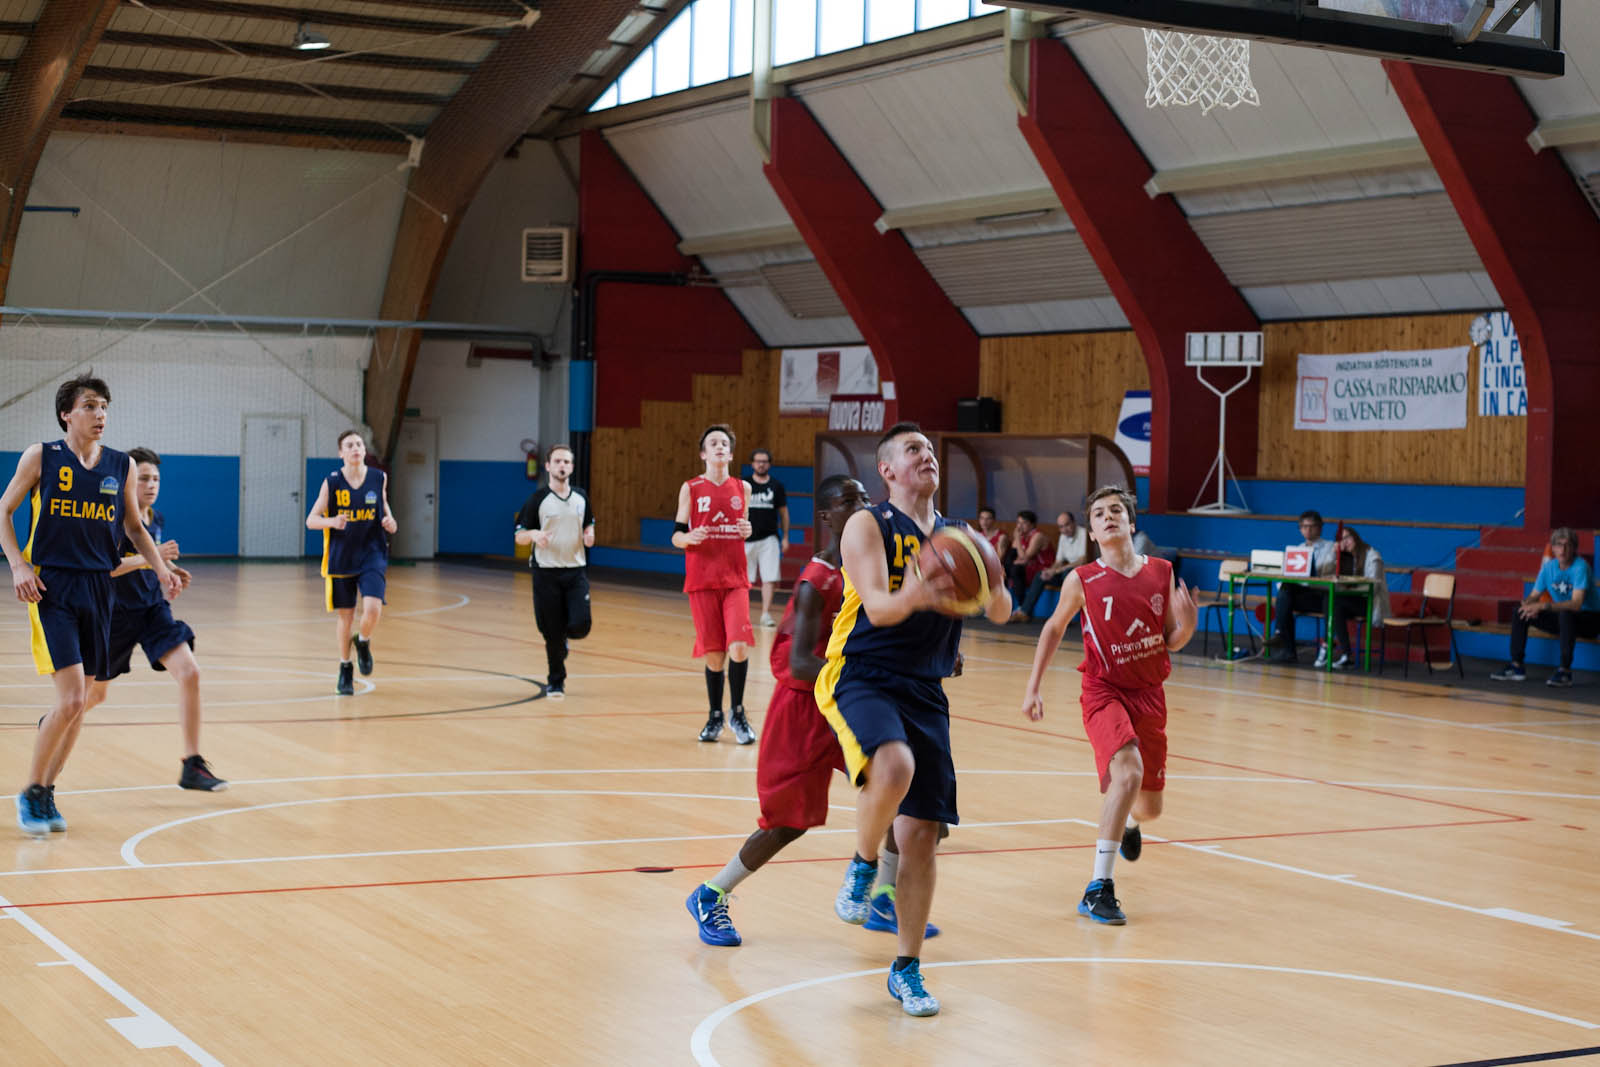 U15_trofeo_primavera_2015_carmignano-9800